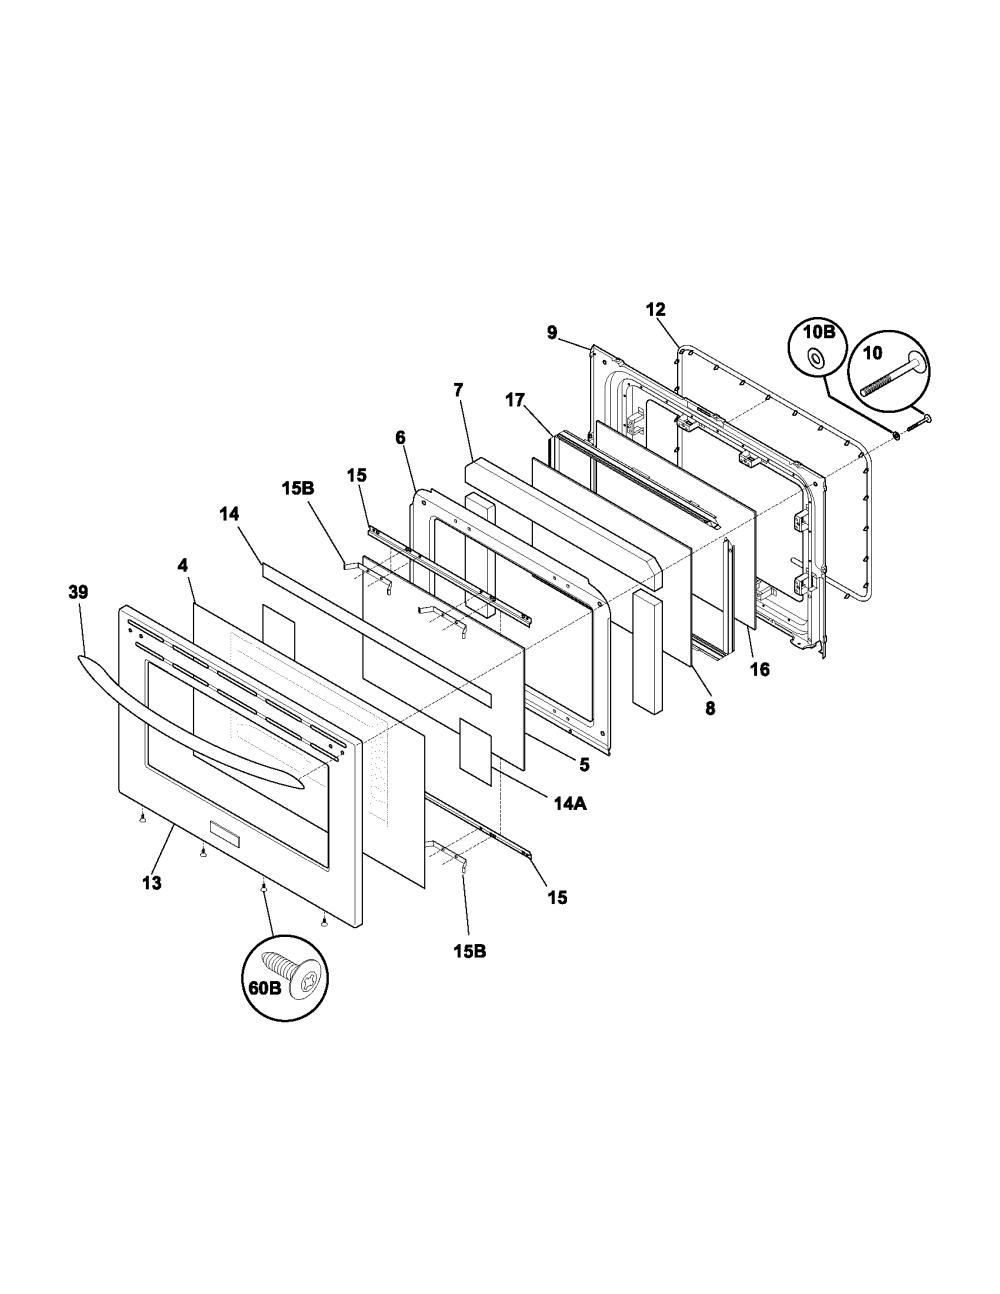 medium resolution of plgf389ccb gas range door parts diagram wiring diagram parts diagram